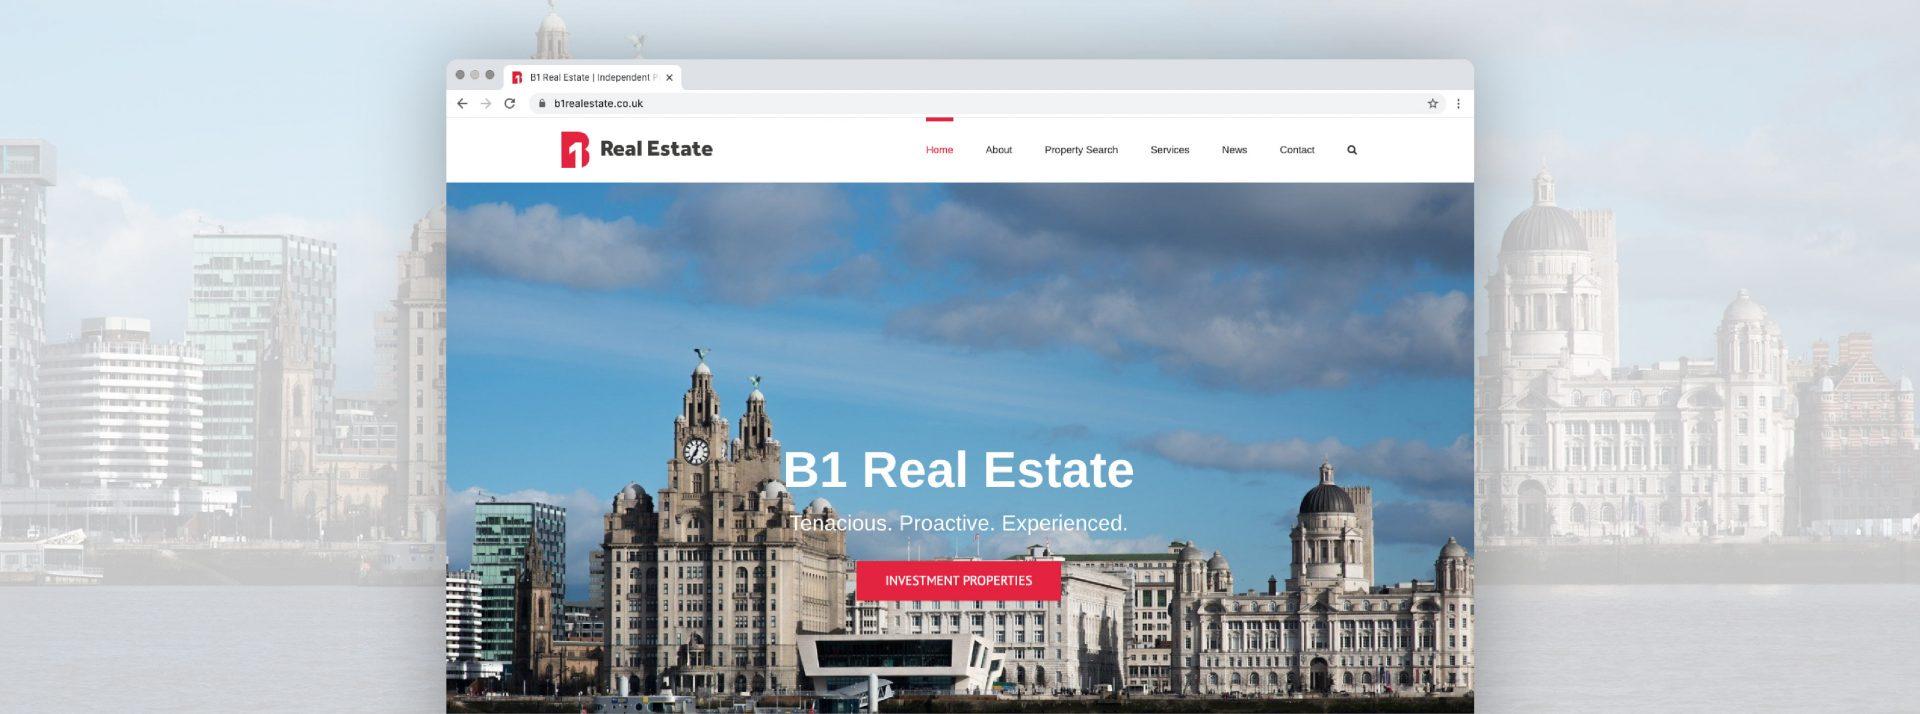 North West Real estate consultants website development